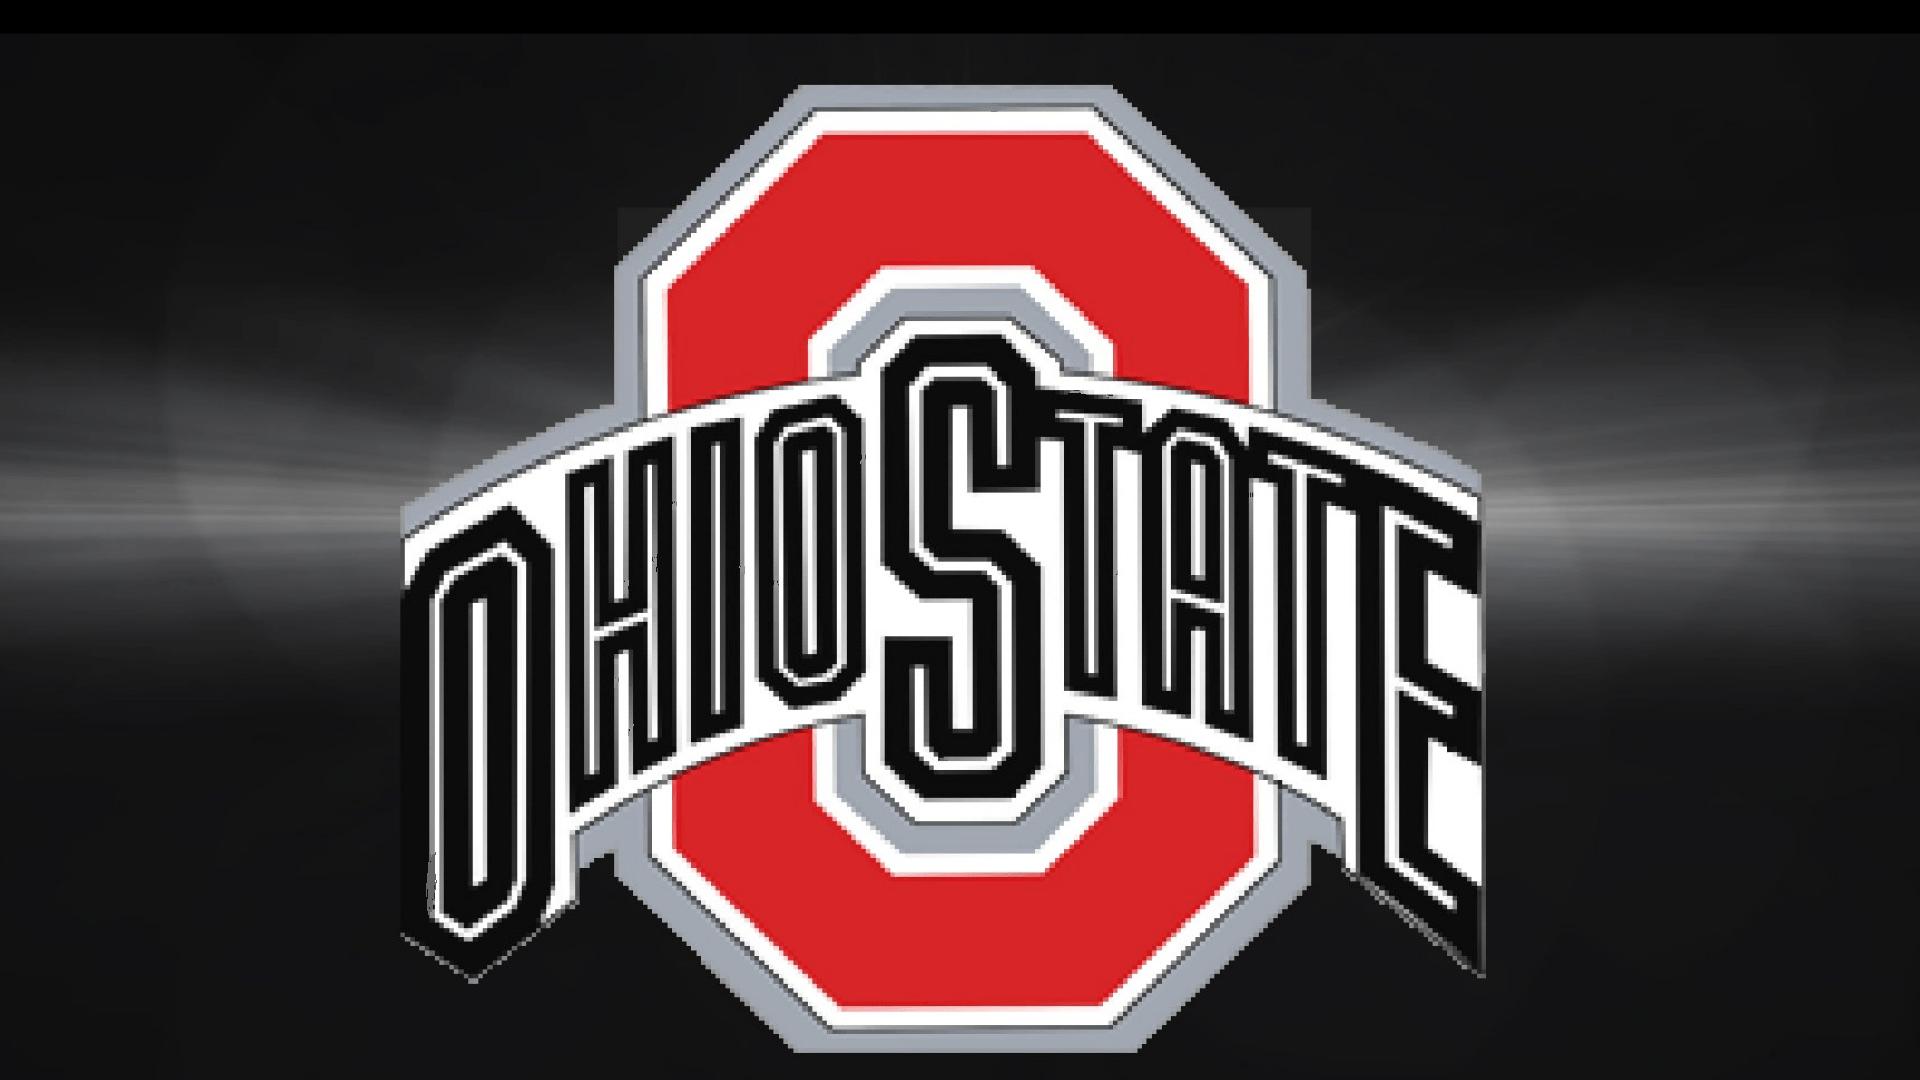 Buckeyes Ohio State